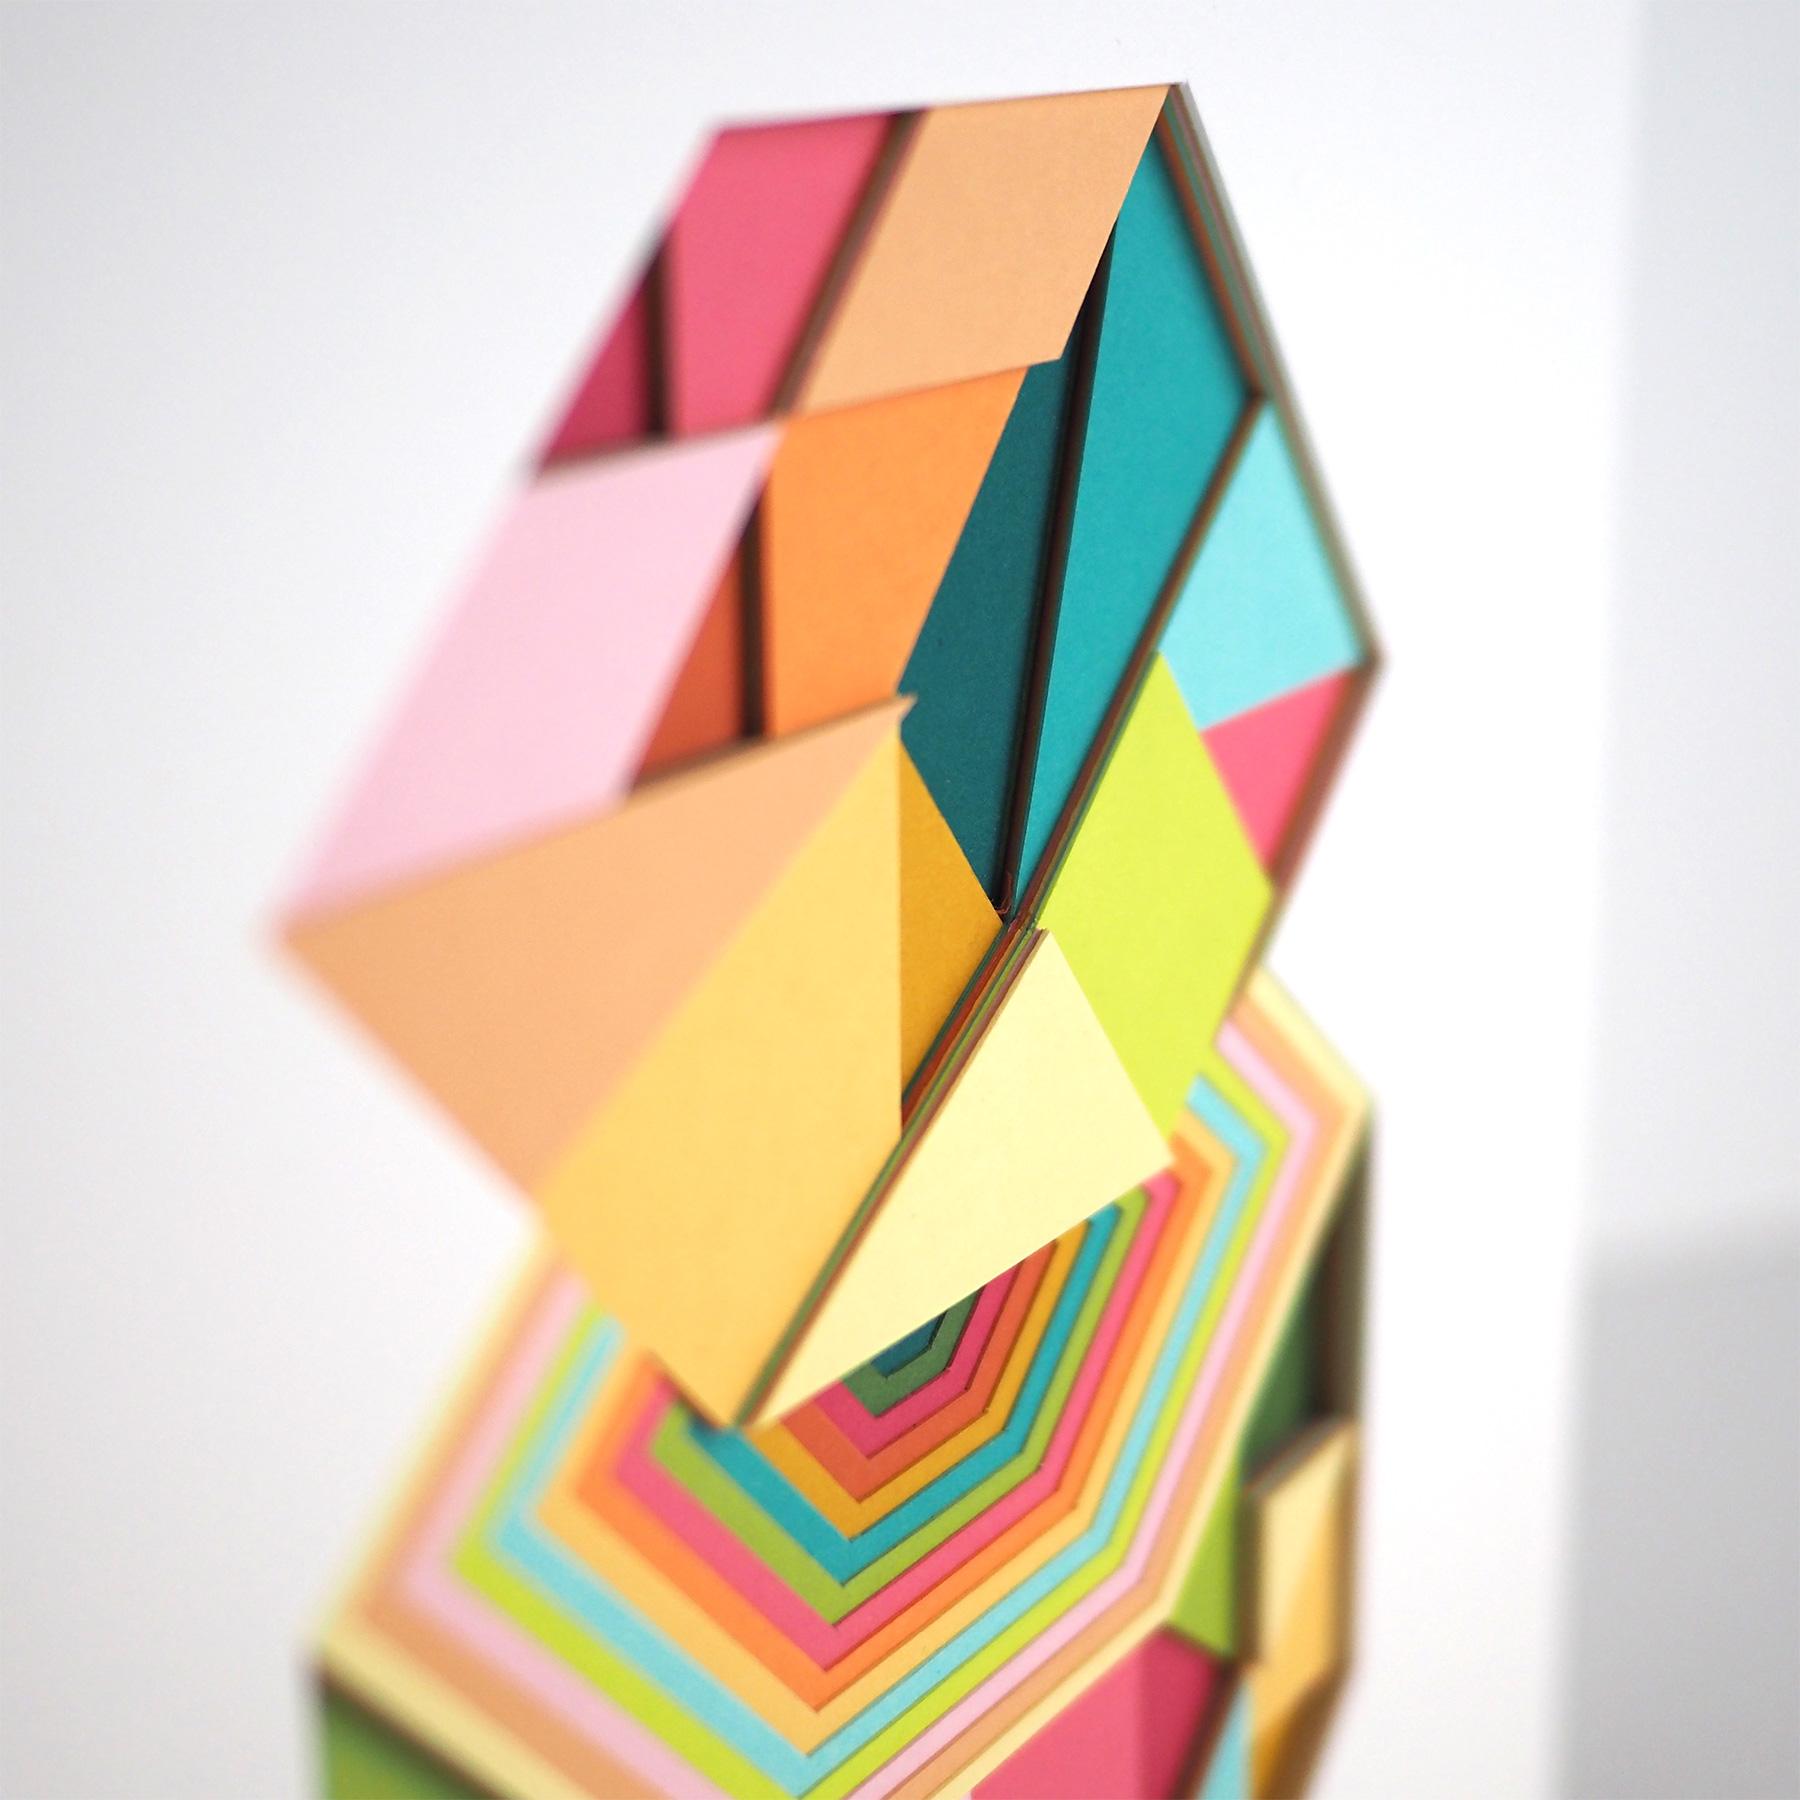 "Huntz Liu untitled 2, 2021 Layered hand-cut paper on wood panel 10"" x 10"""